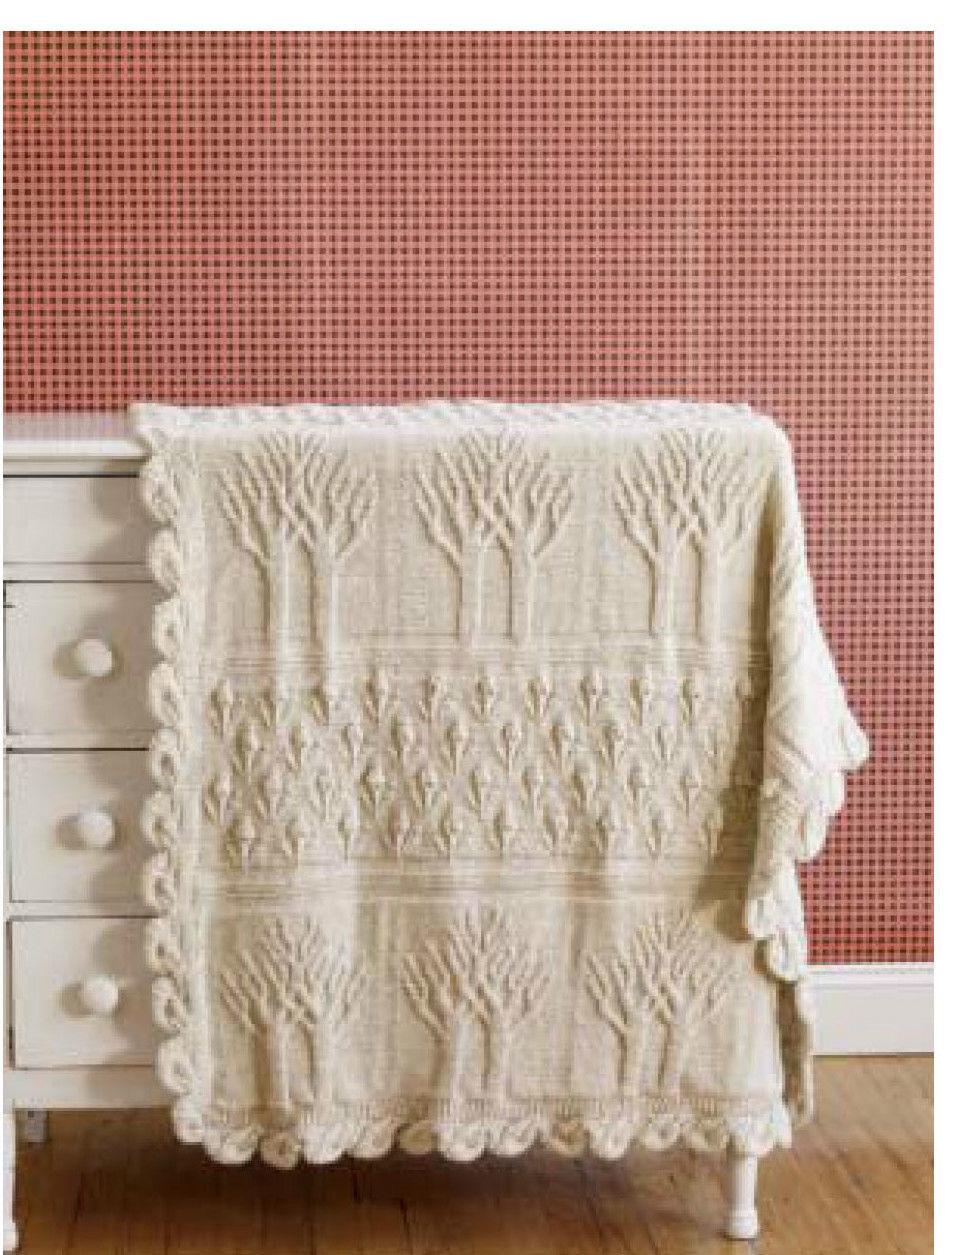 0.99 GBP - Tree Afghan Throw Knitting Pattern 99P #ebay #Home ...